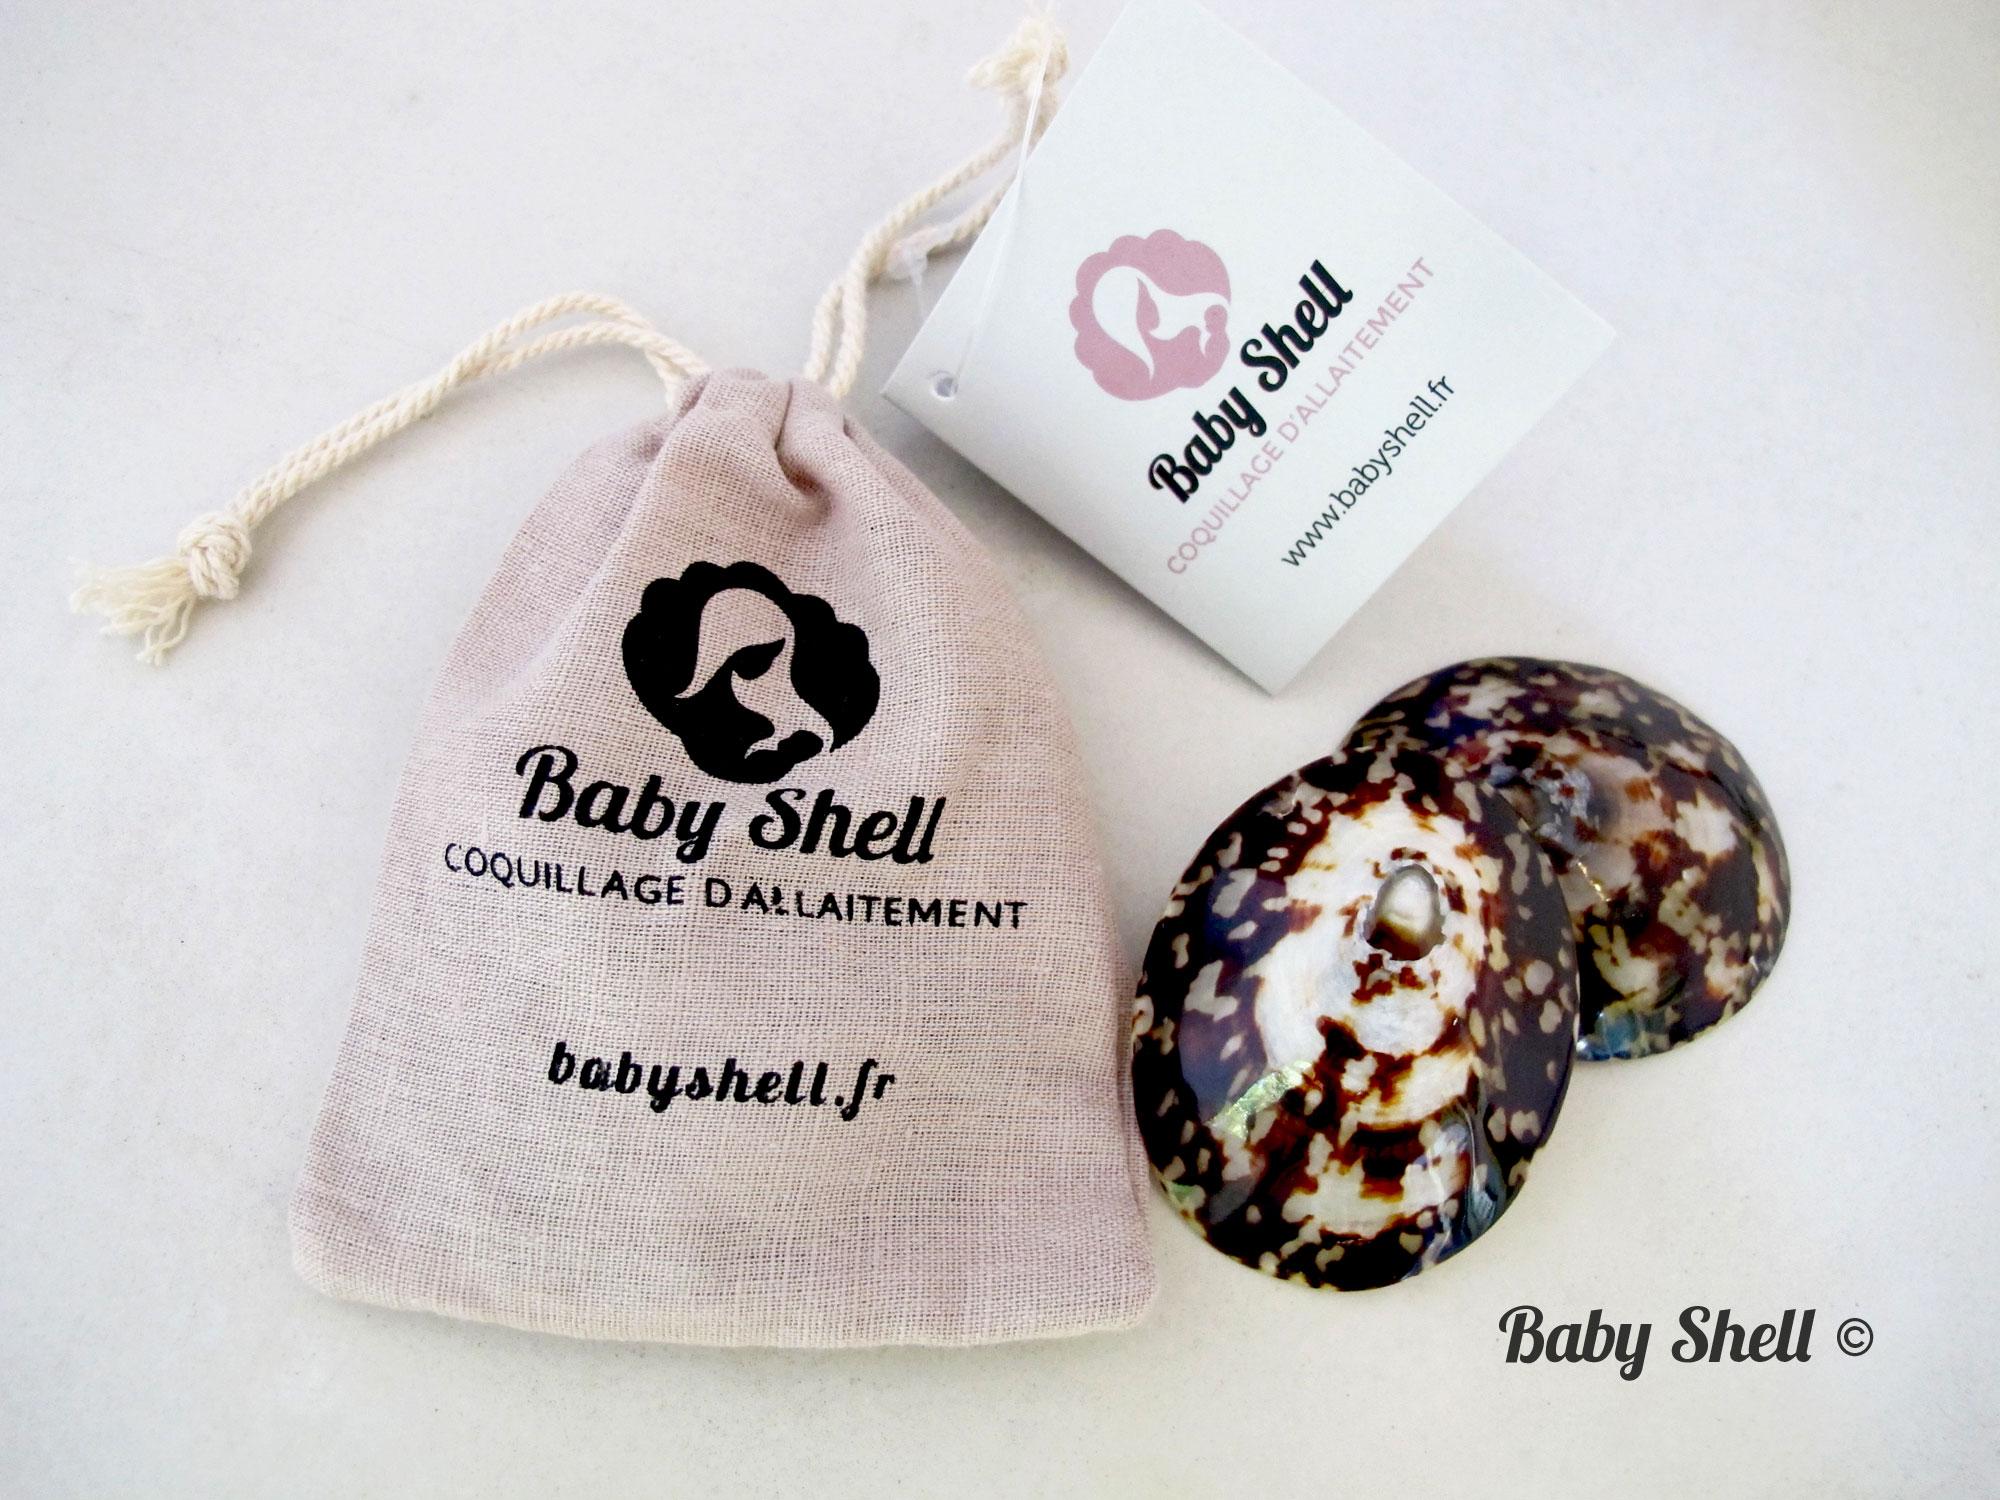 Coquillage d'allaitement BABY SHELL